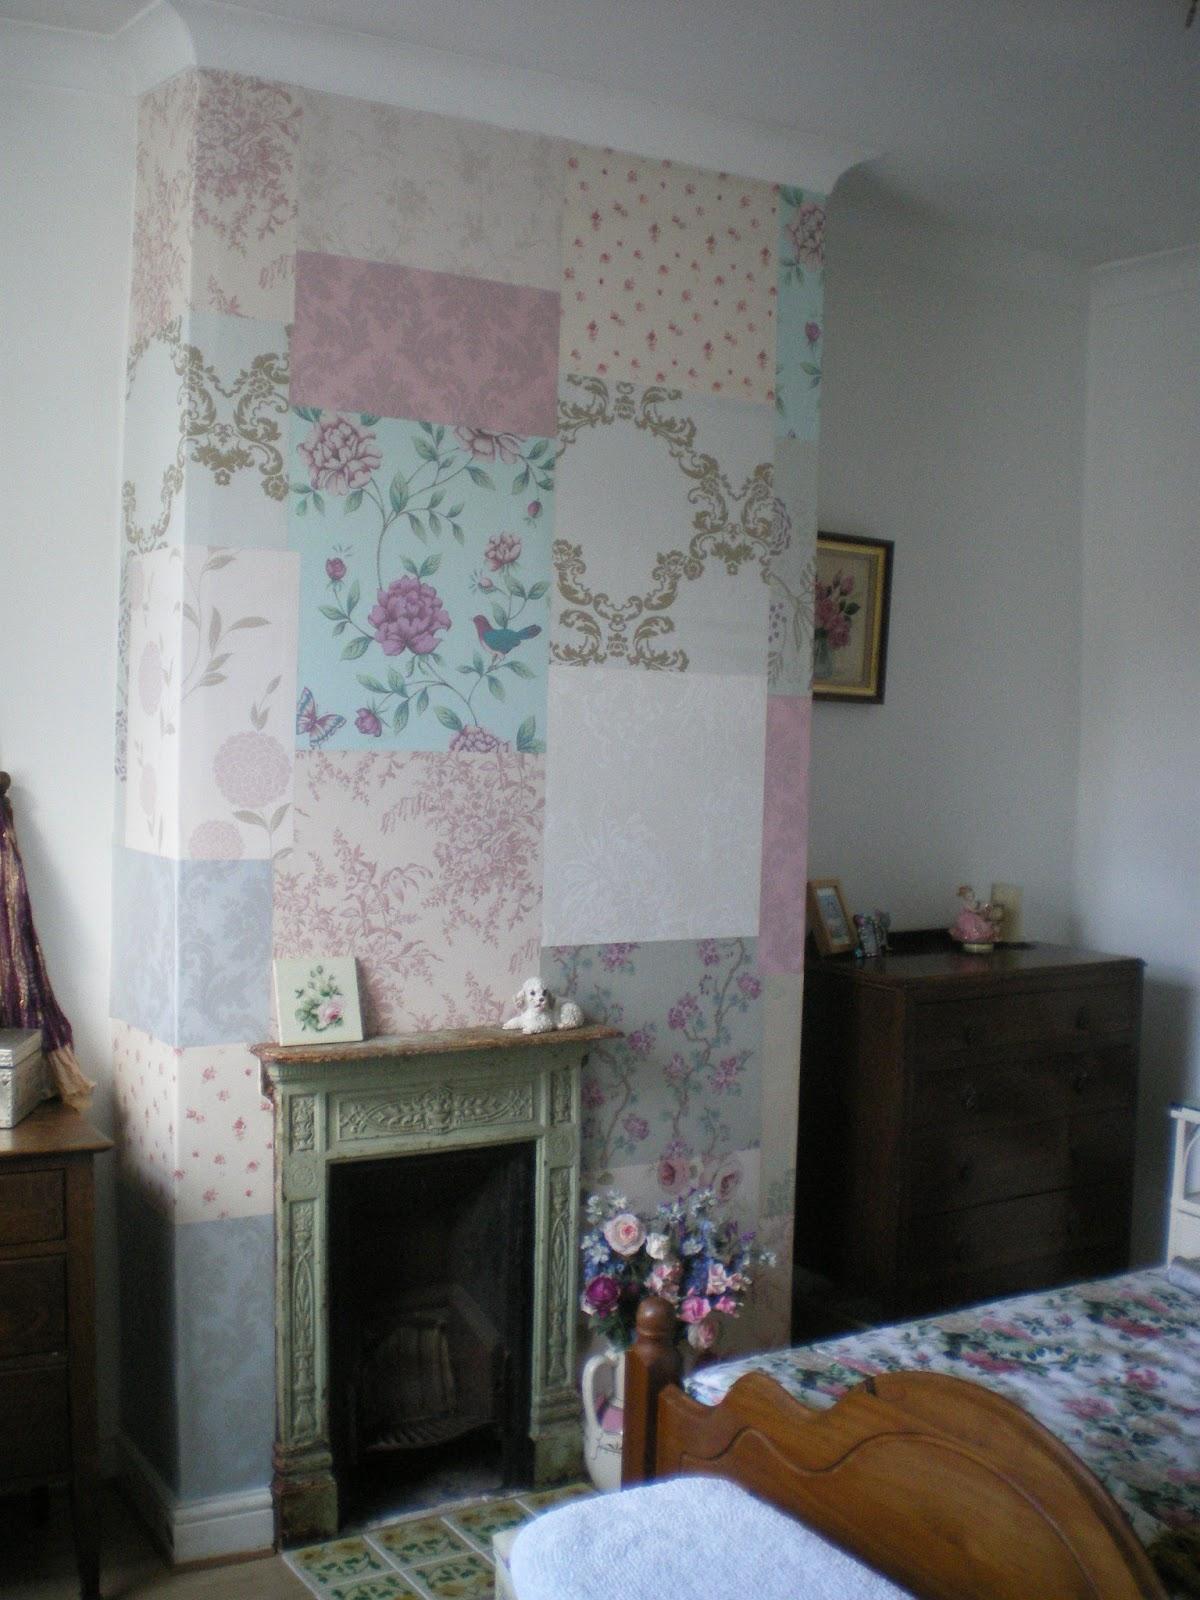 Wallpaper Feature Wall Chimney Breast   Free Download Wallpaper   DaWallpaperz